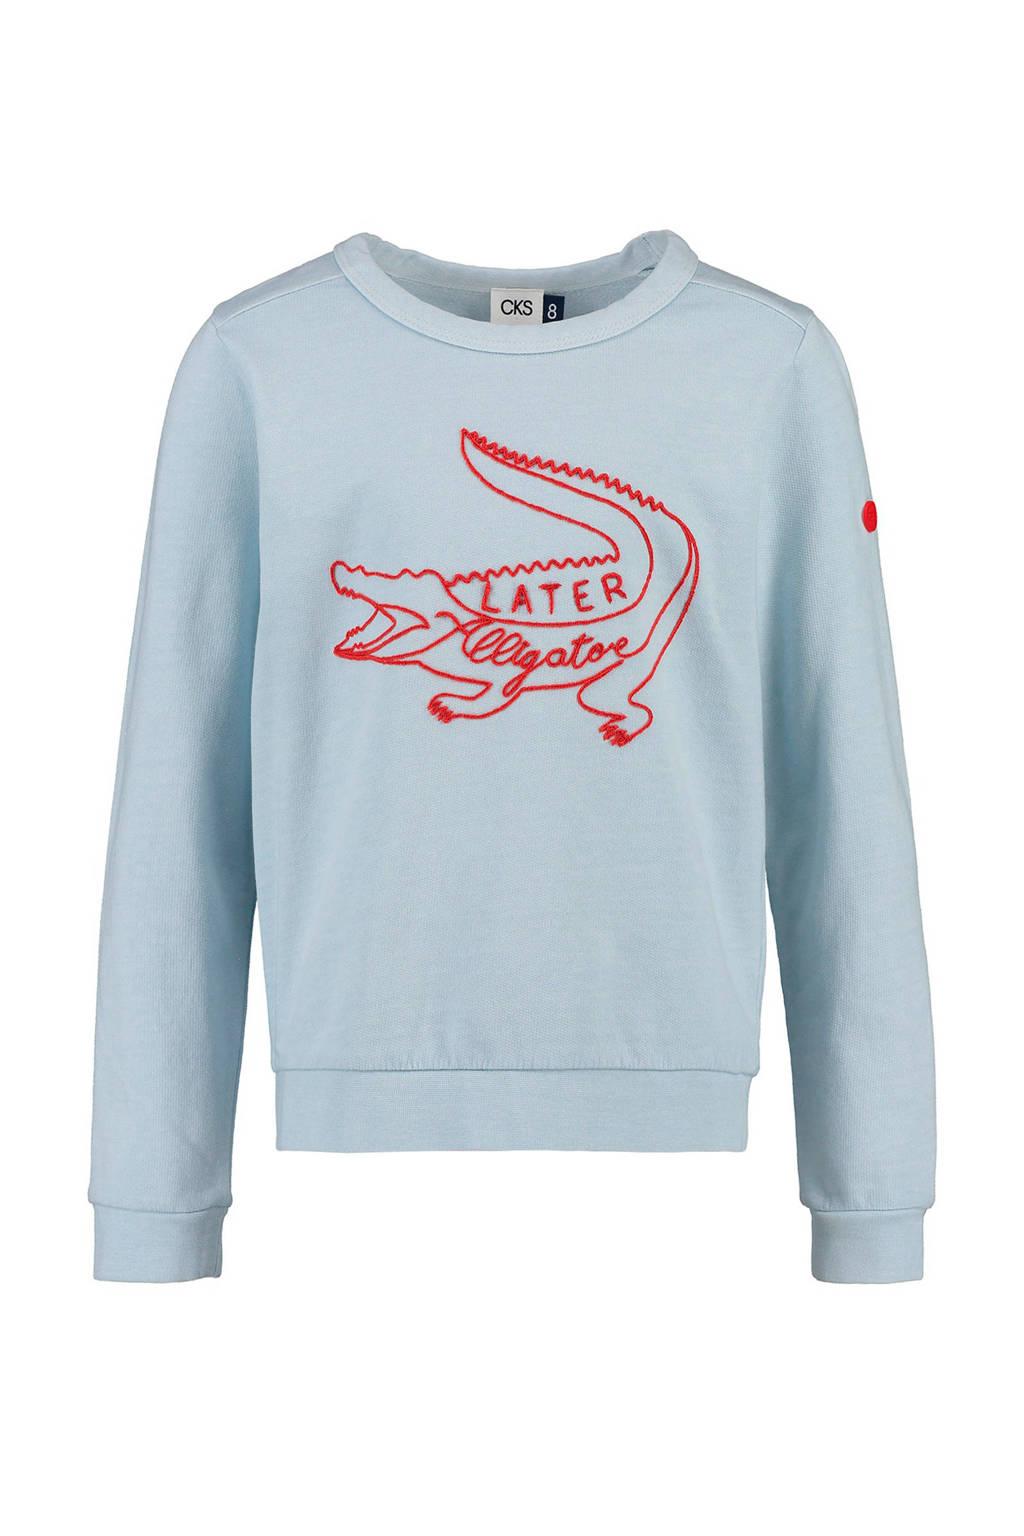 CKS KIDS sweater Bernian met krokodil blauw, Lichtblauw